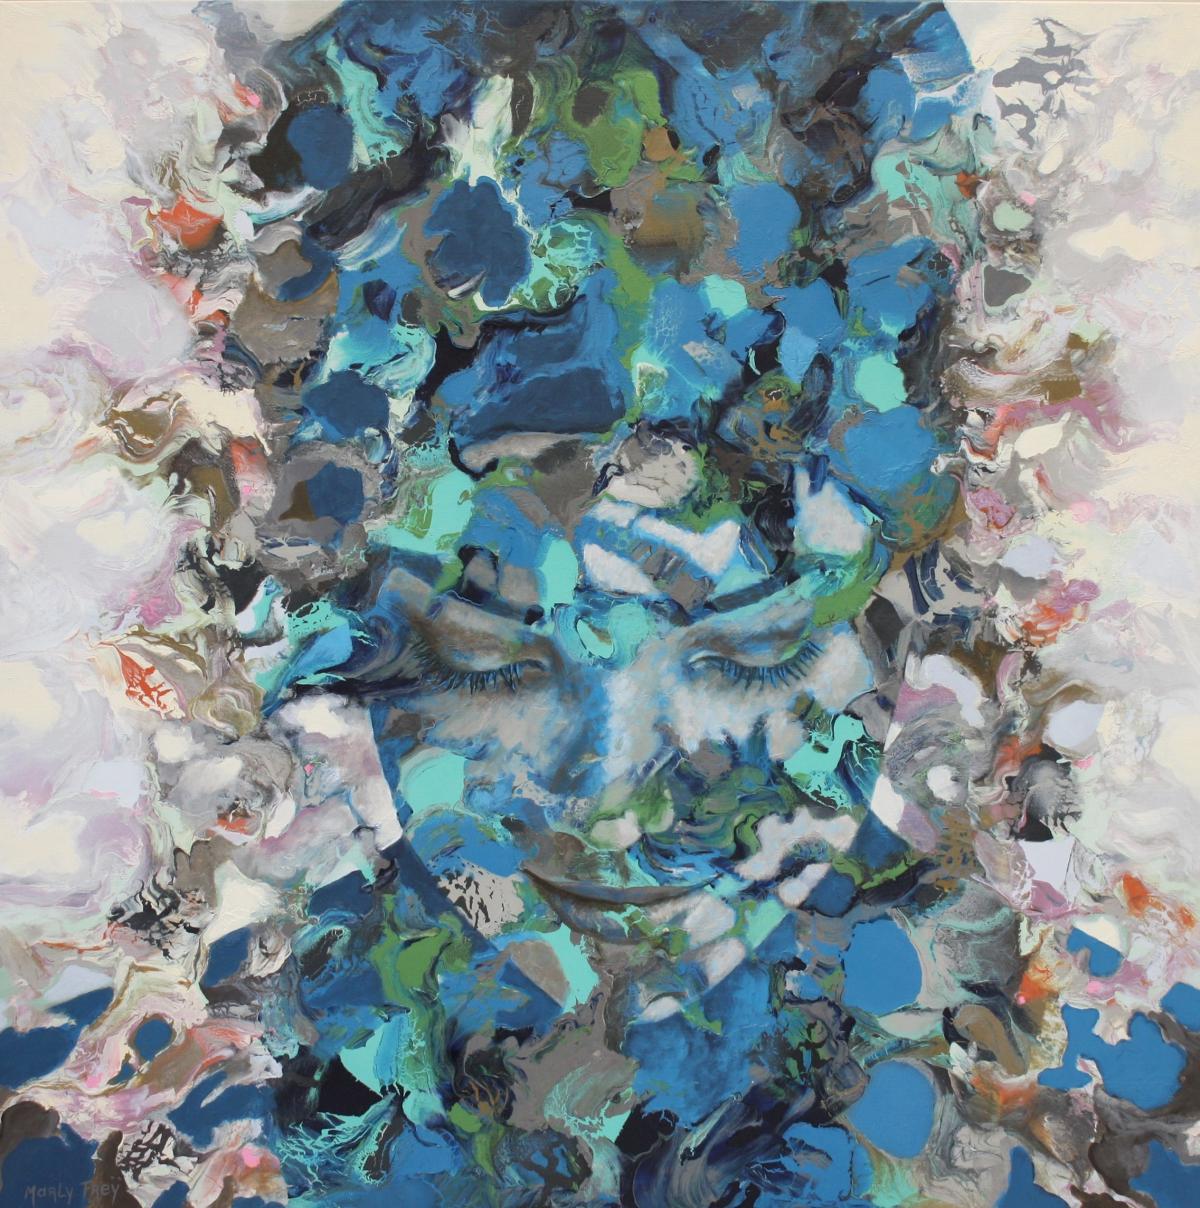 Kunst: July van kunstenaar Marly Freij(portretten)